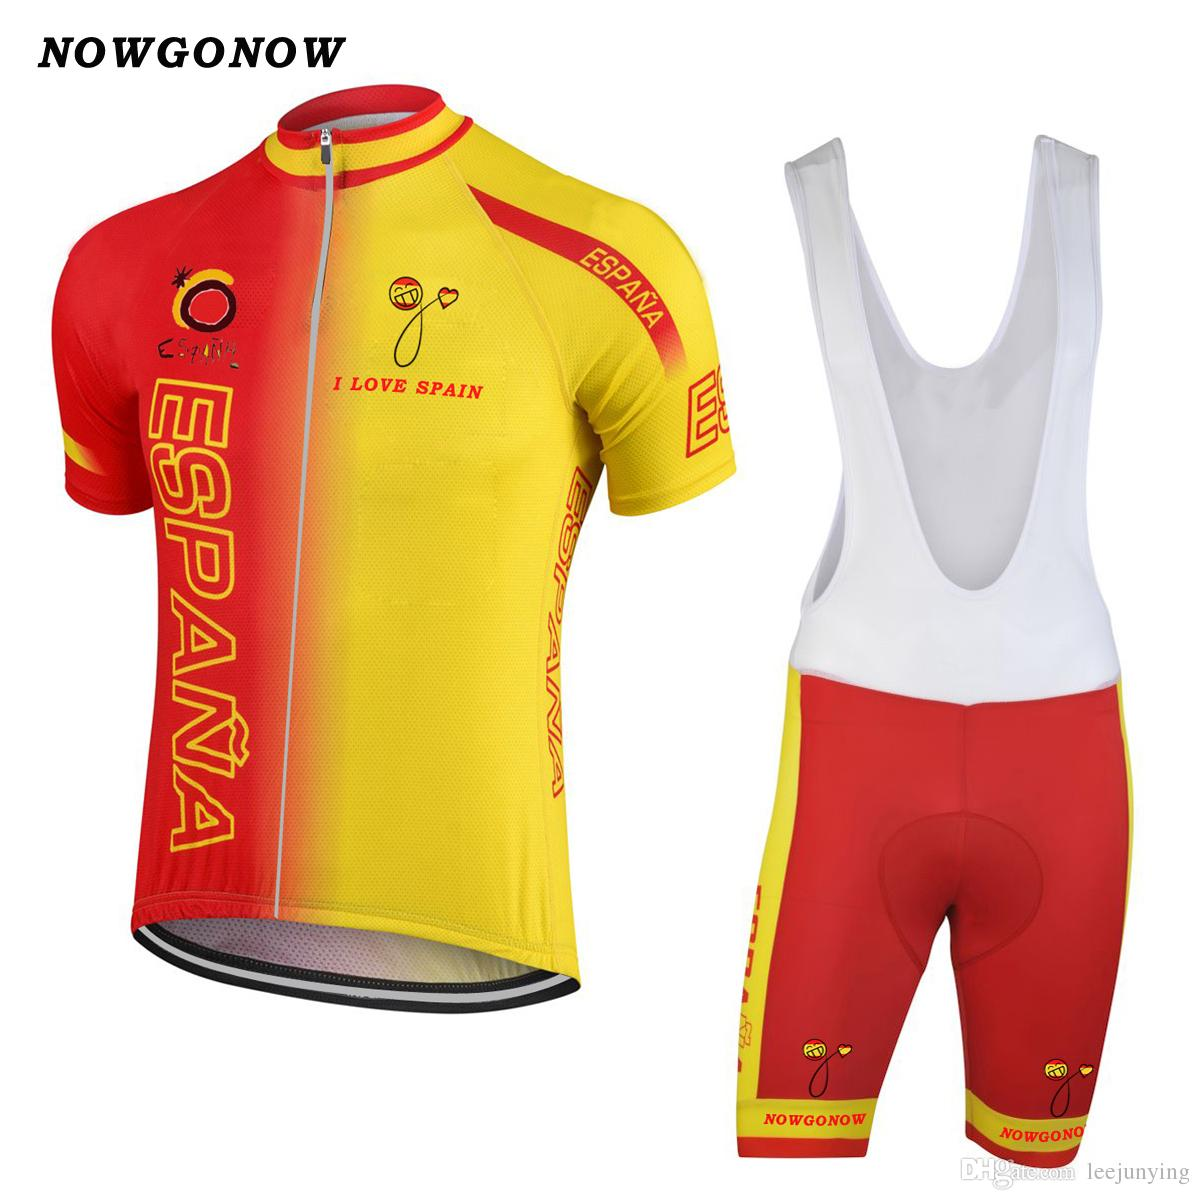 MEN 2017 Spain National Team Cycling Jersey Set Bike Clothing Wear Yellow  Red National Team Maillot Ciclismo Bib Gel Pad Shorts Bike Shirt Cycling  Outfit ... 773bd4c86